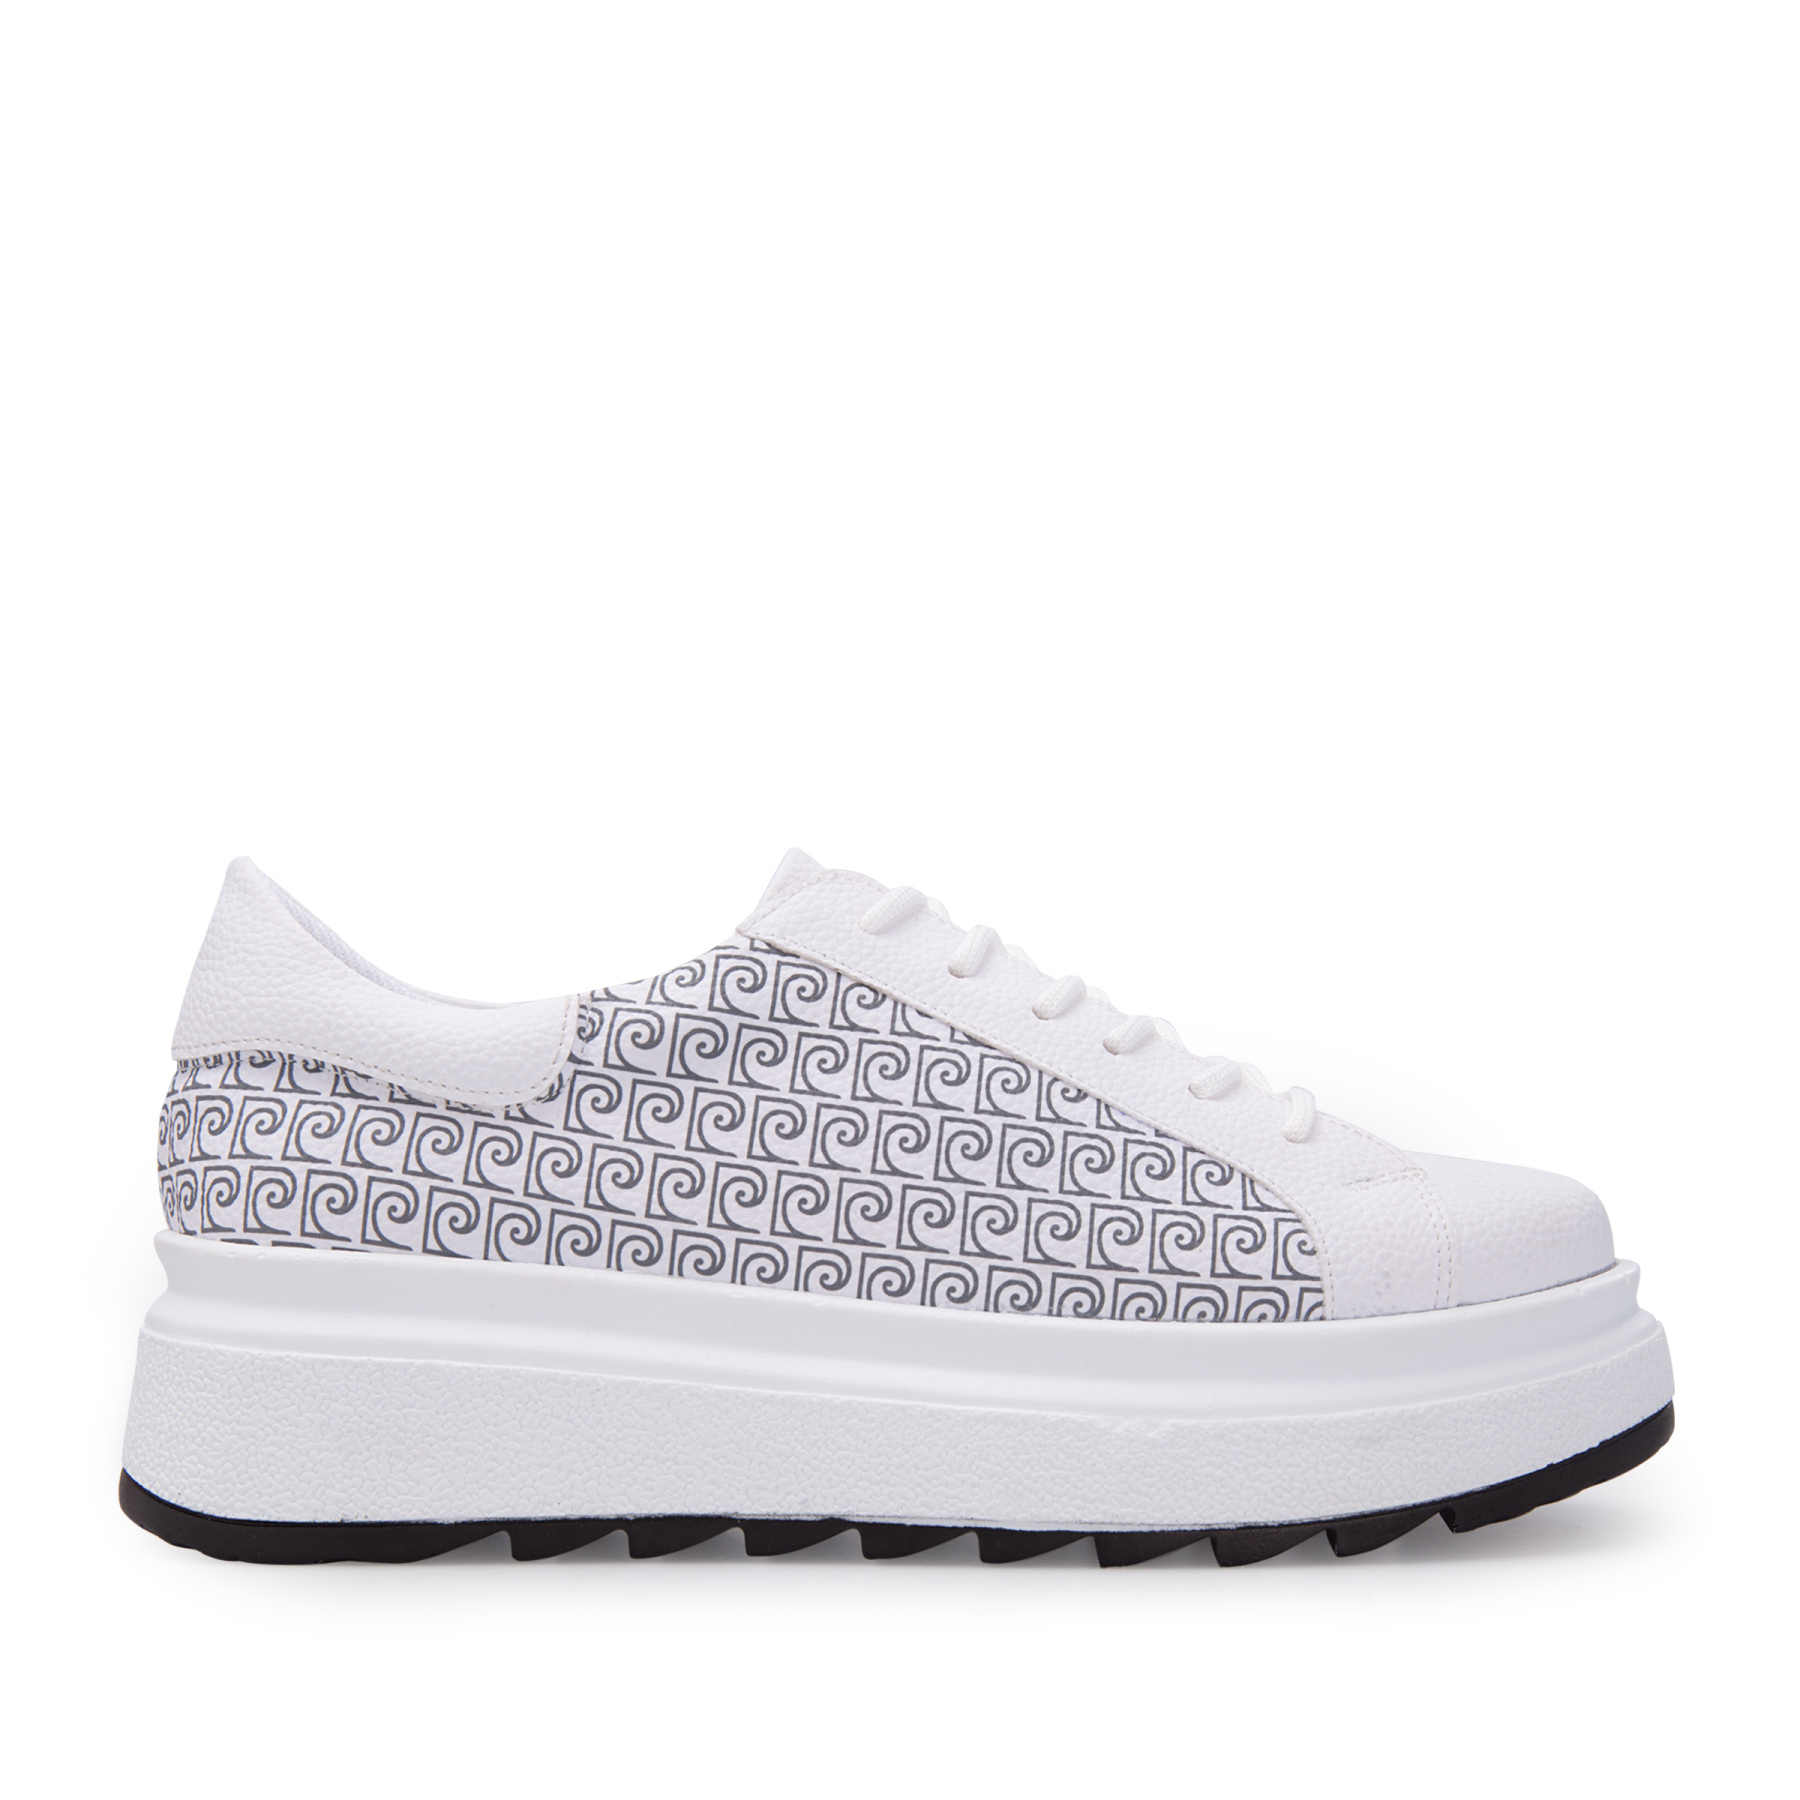 Pierre Cardin Shoes WOMEN SHOES 53040